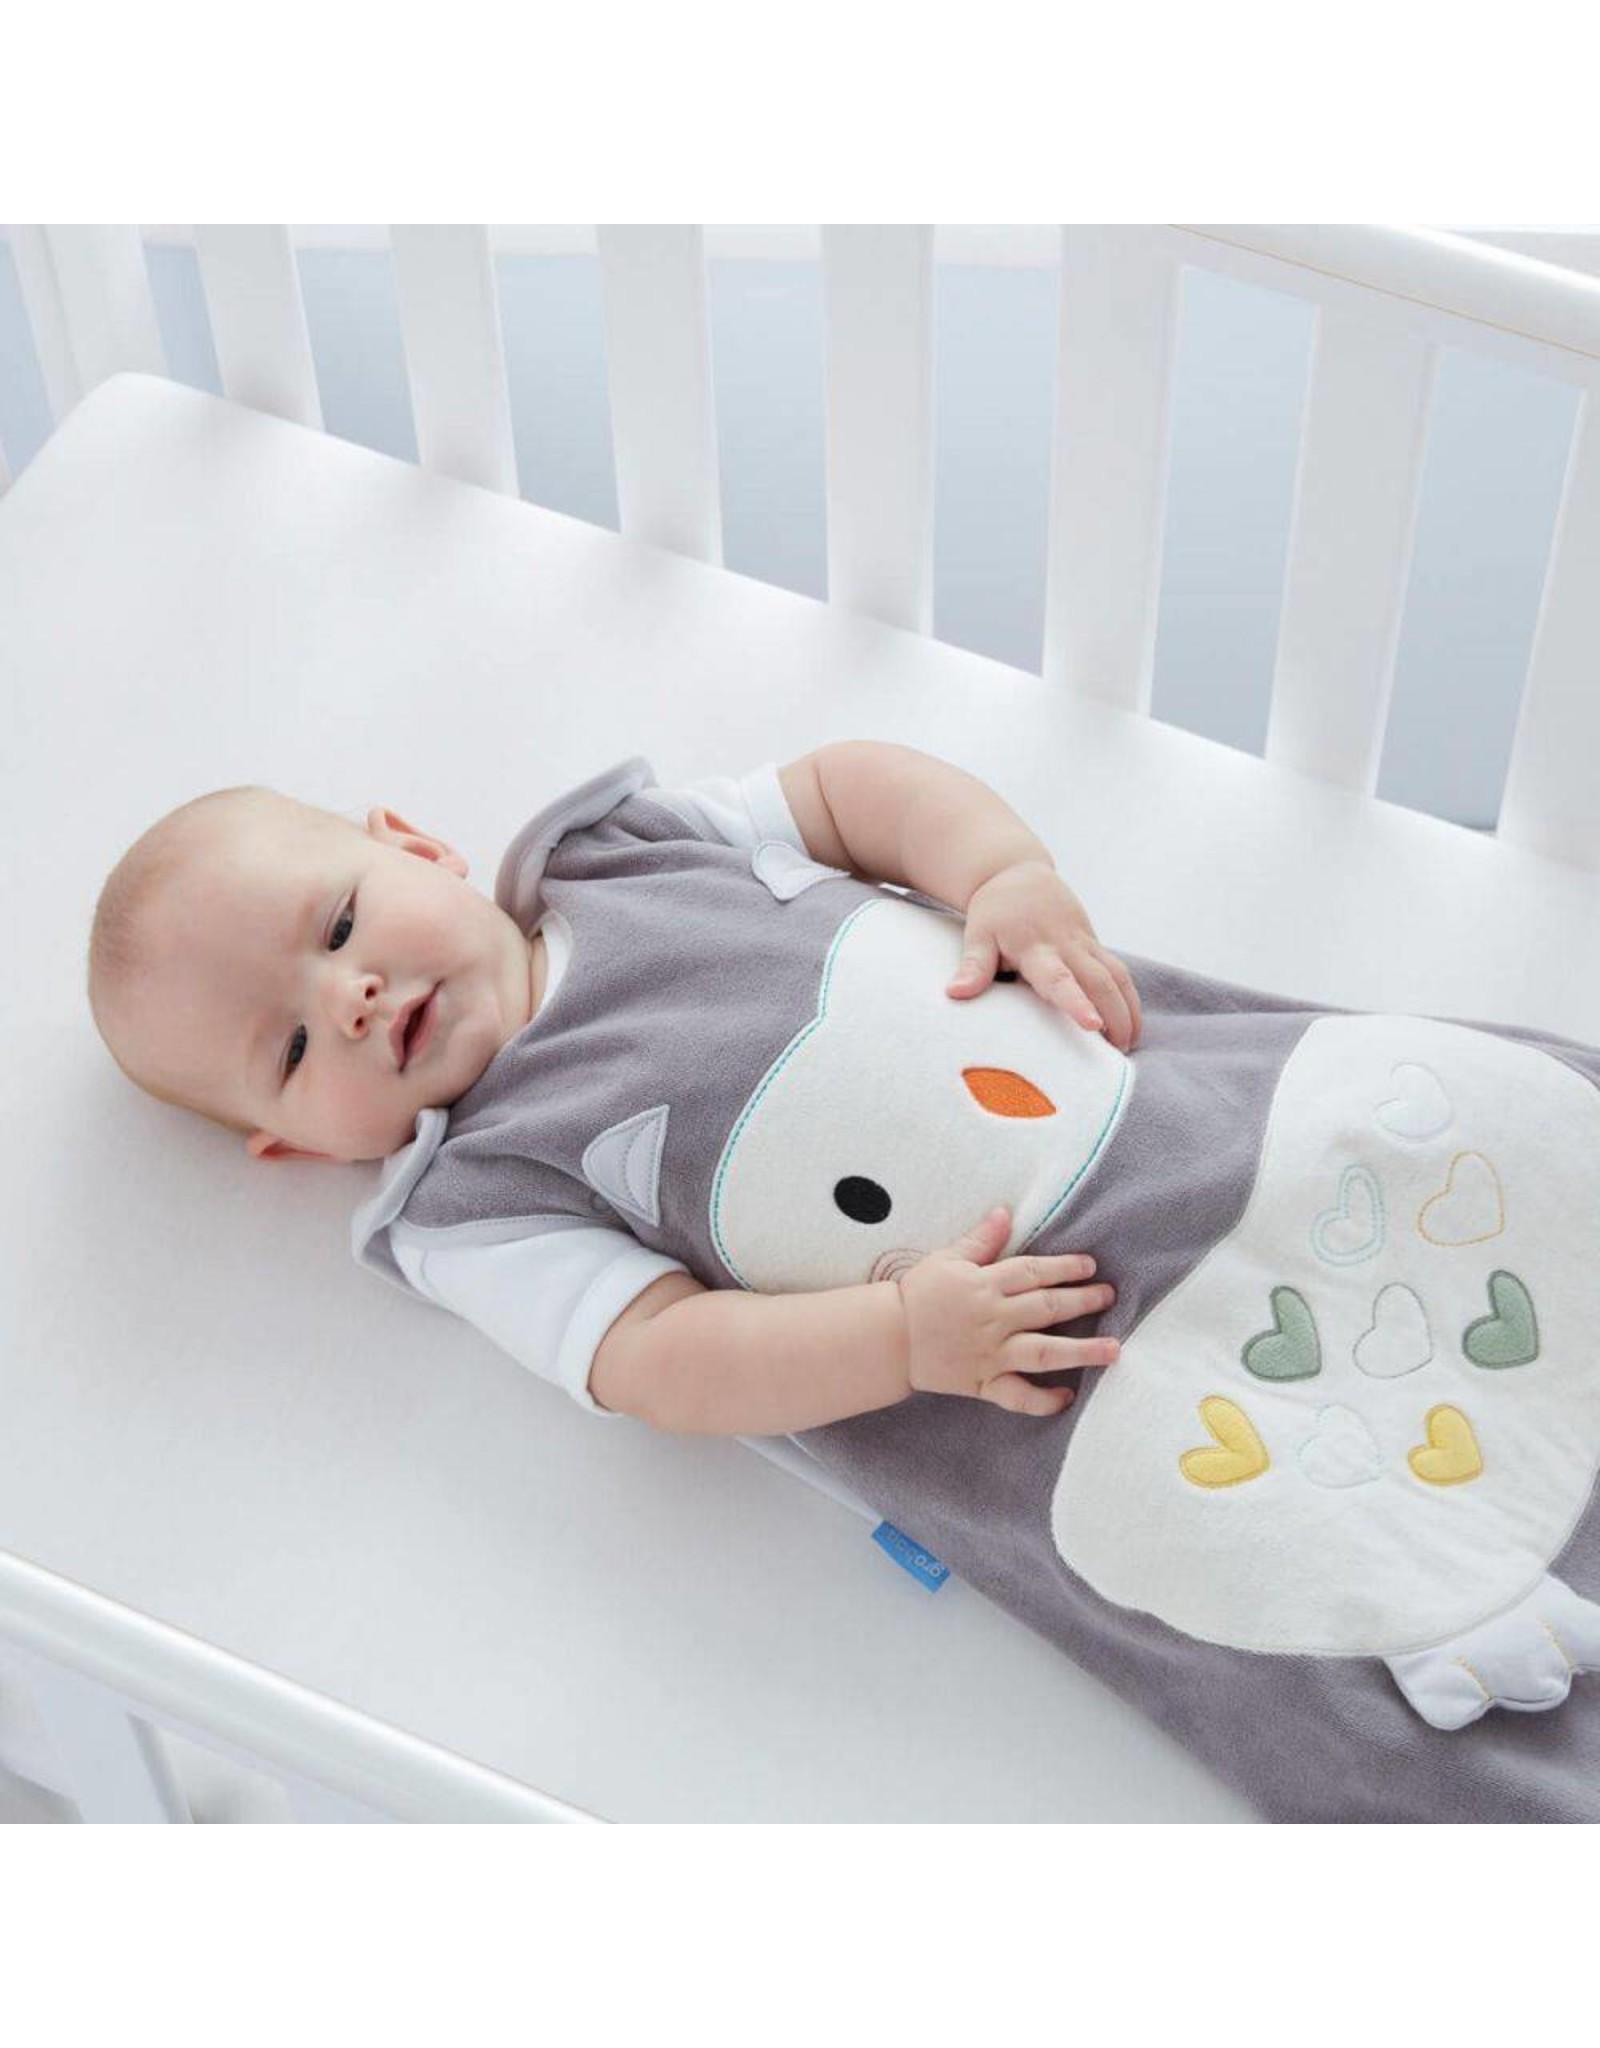 Gro Company Gro Company - Ollie the Owl Sleeping Bag 2.5 Tog 6-18 months